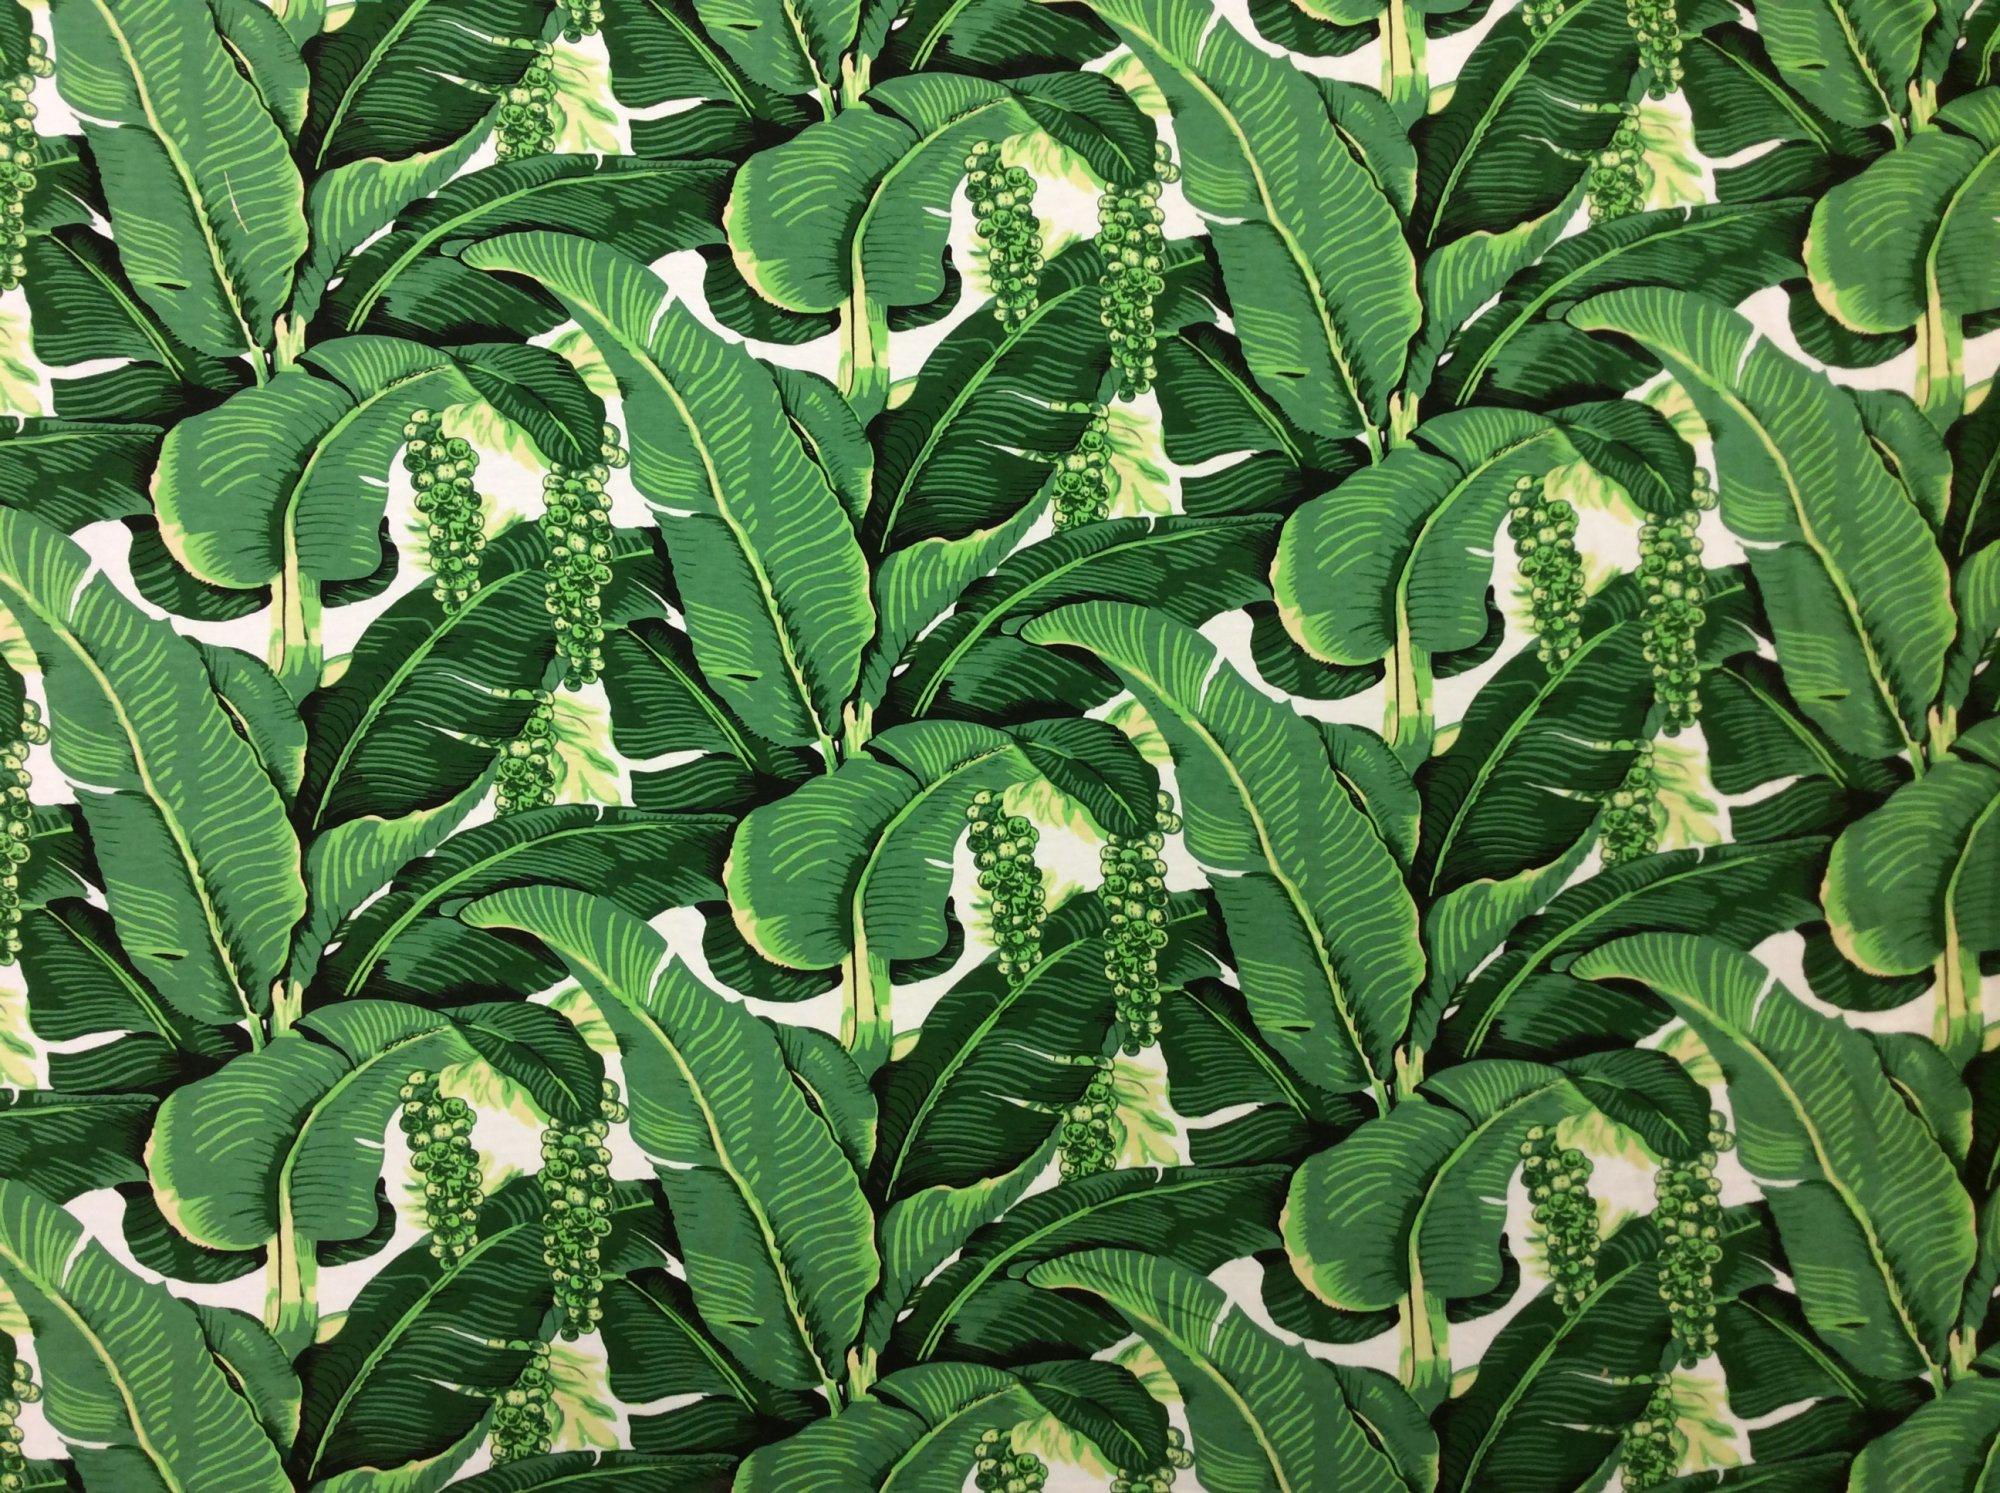 Palm Leaf Tropical Mod Style Bedhead Cotton Lycra Knit Apparel Fabric RMRC5958